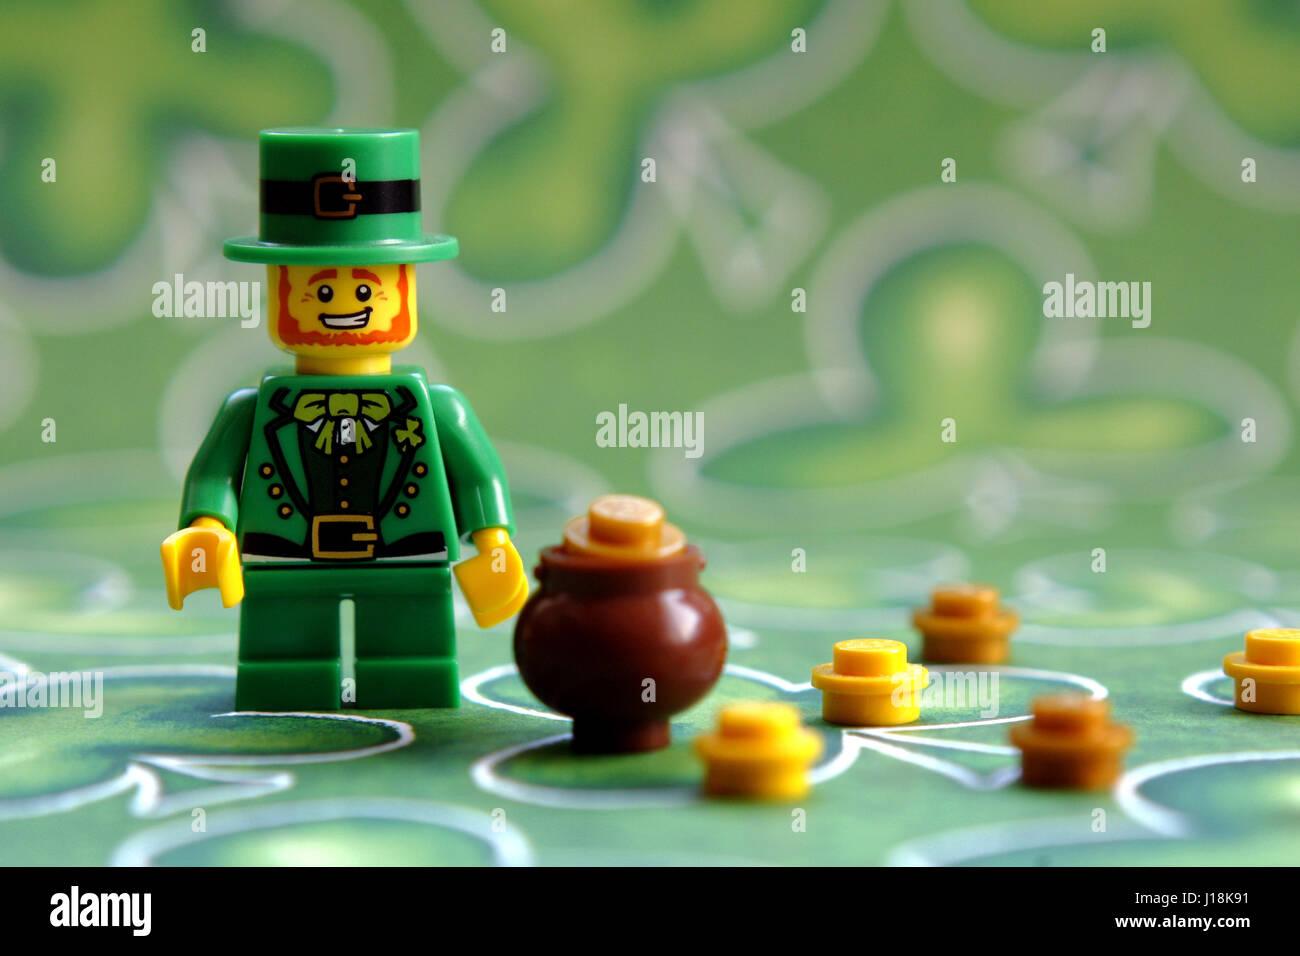 LEGO NEW GREEN LEPRECHAUN MINIFIGURE ST PATRICKS DAY IRISH FIGURE POT OF GOLD